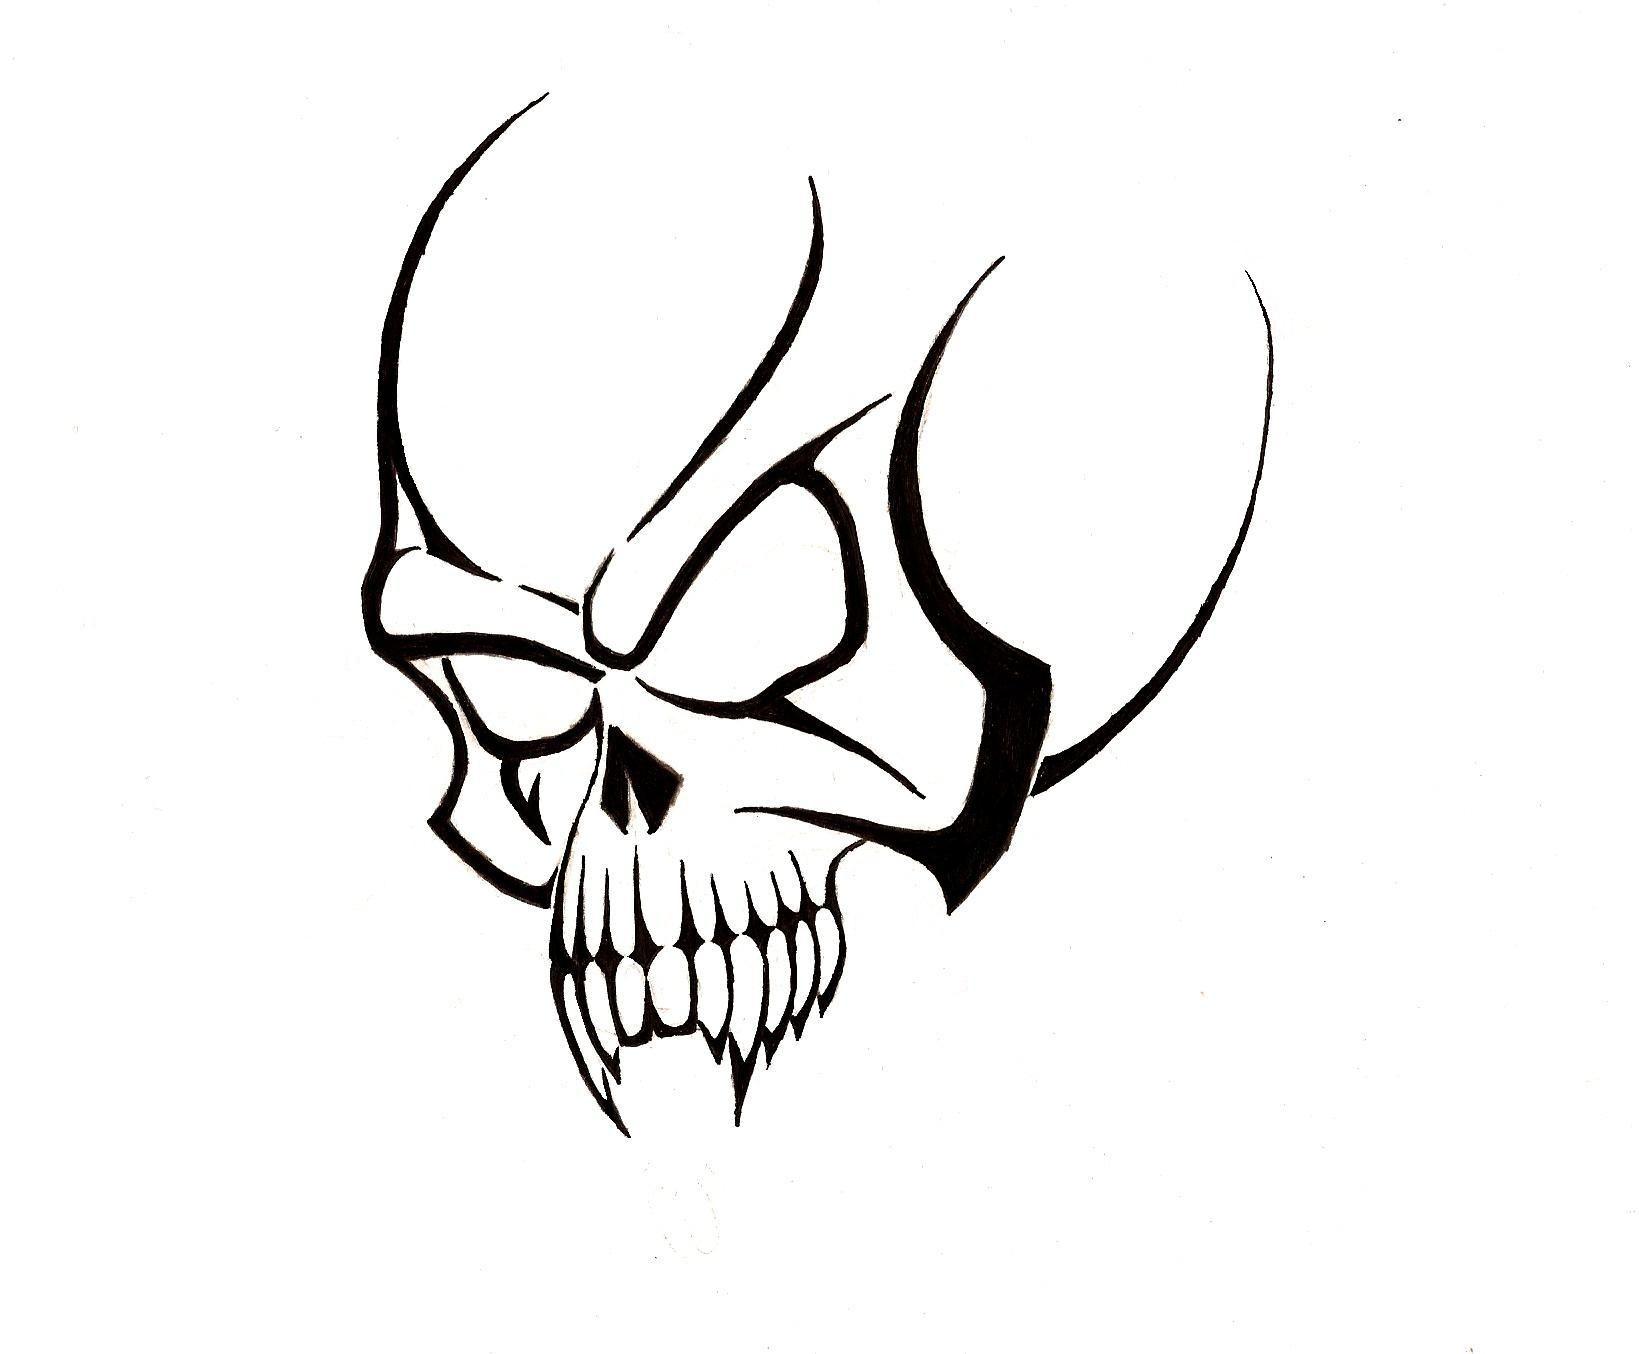 Free skull tattoo designs to print clipart best